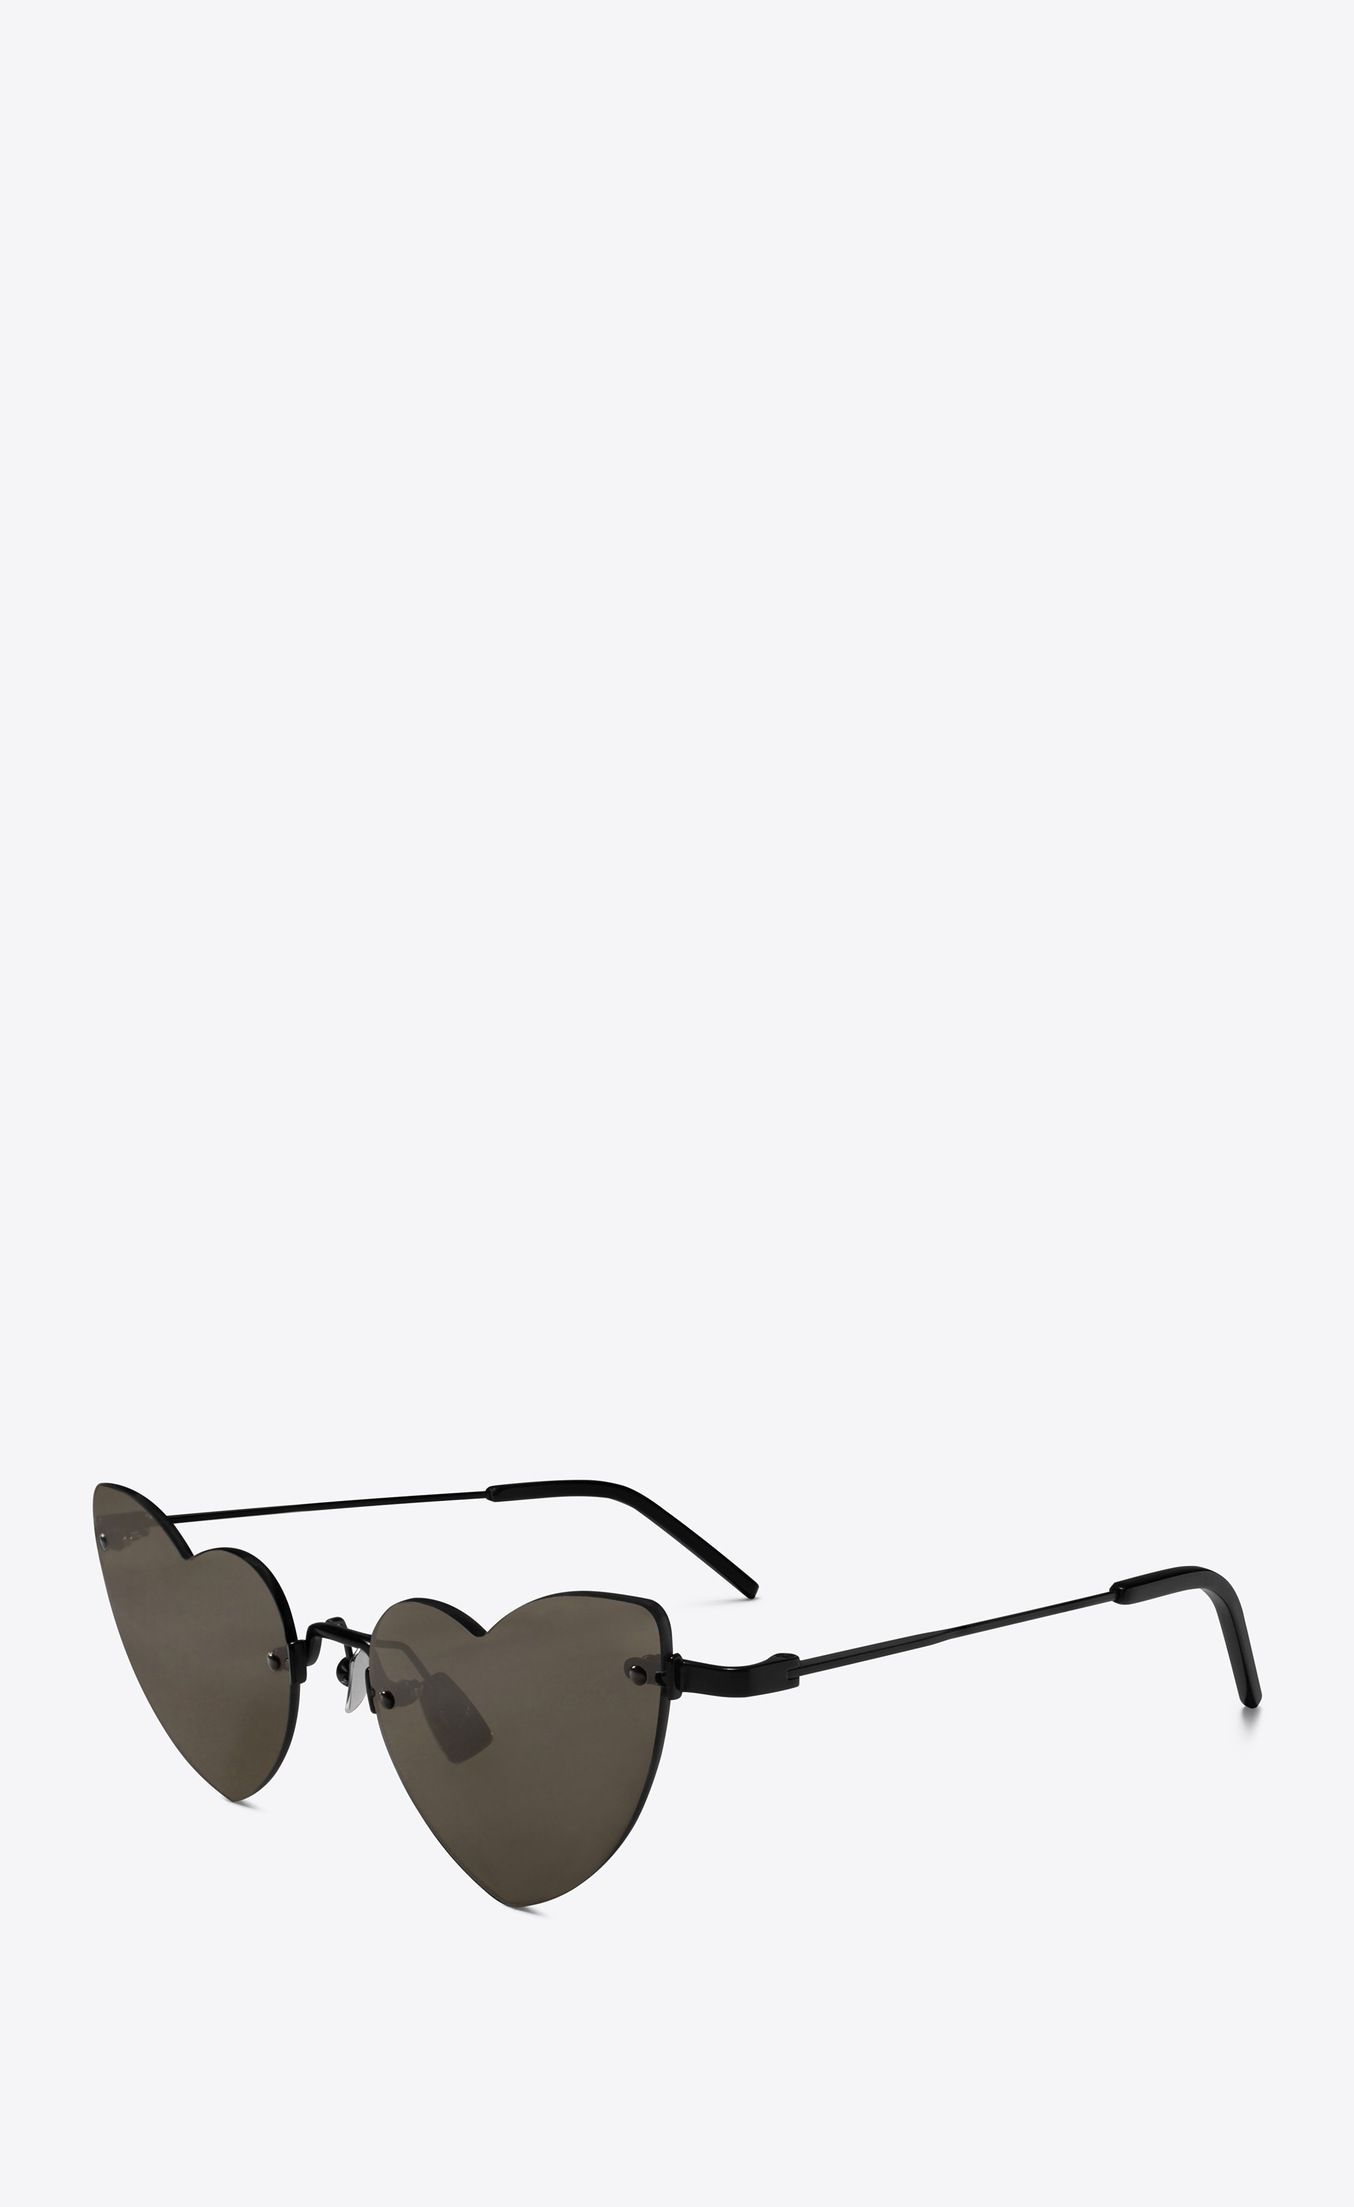 c161a6f3bc60 New wave sl 254 loulou in 2019   FASHION   Accessories   Sunglasses ...